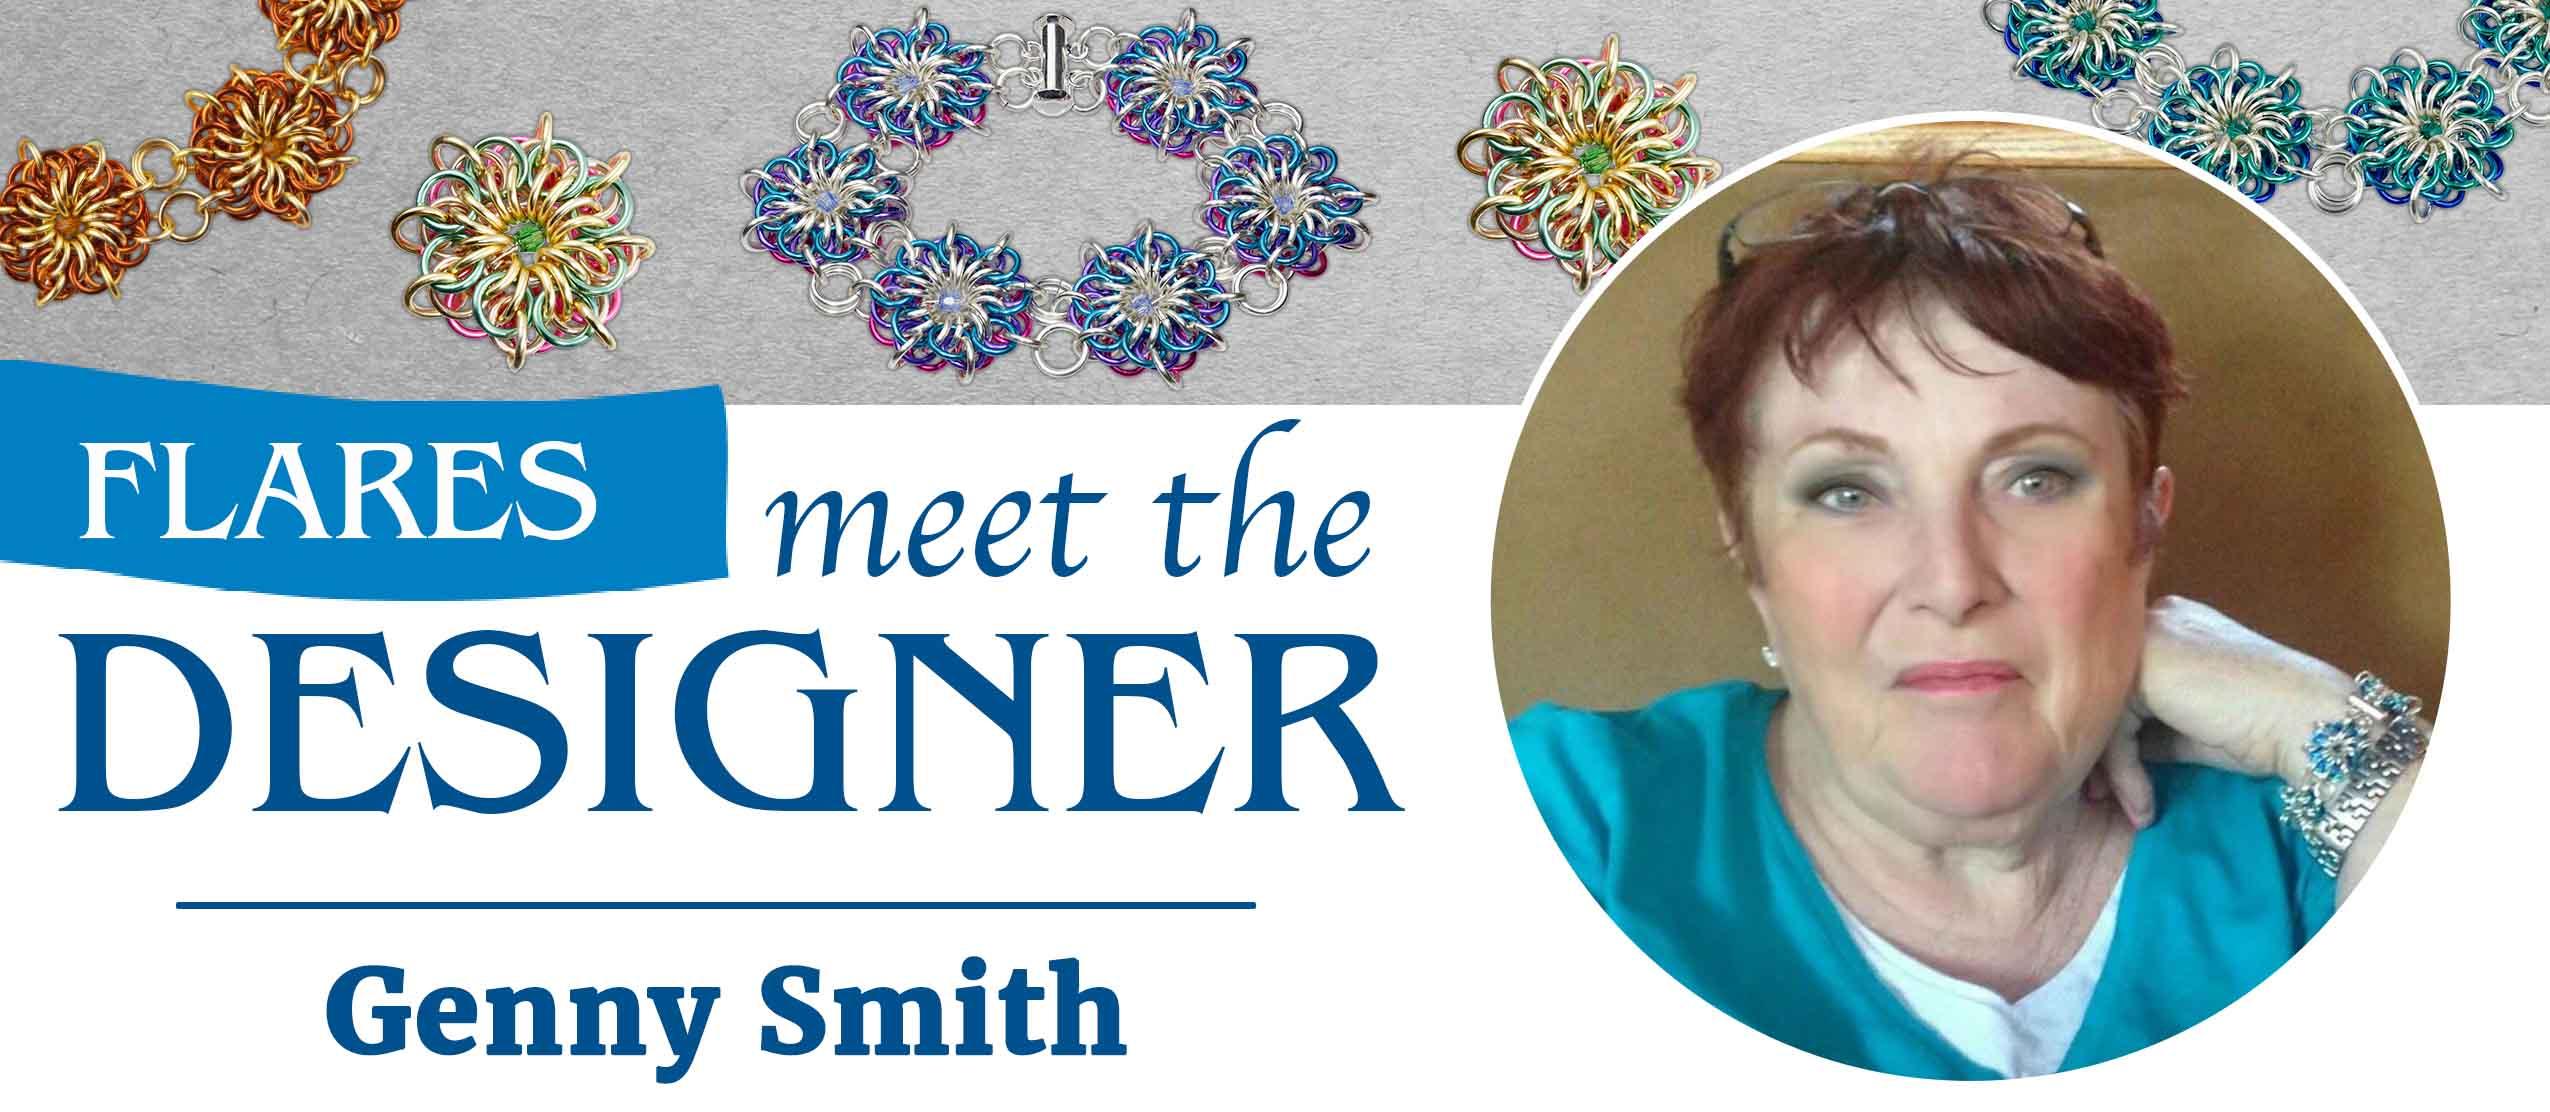 meet-the-designers-genny-smith-flares-bracelet-kits-.jpg